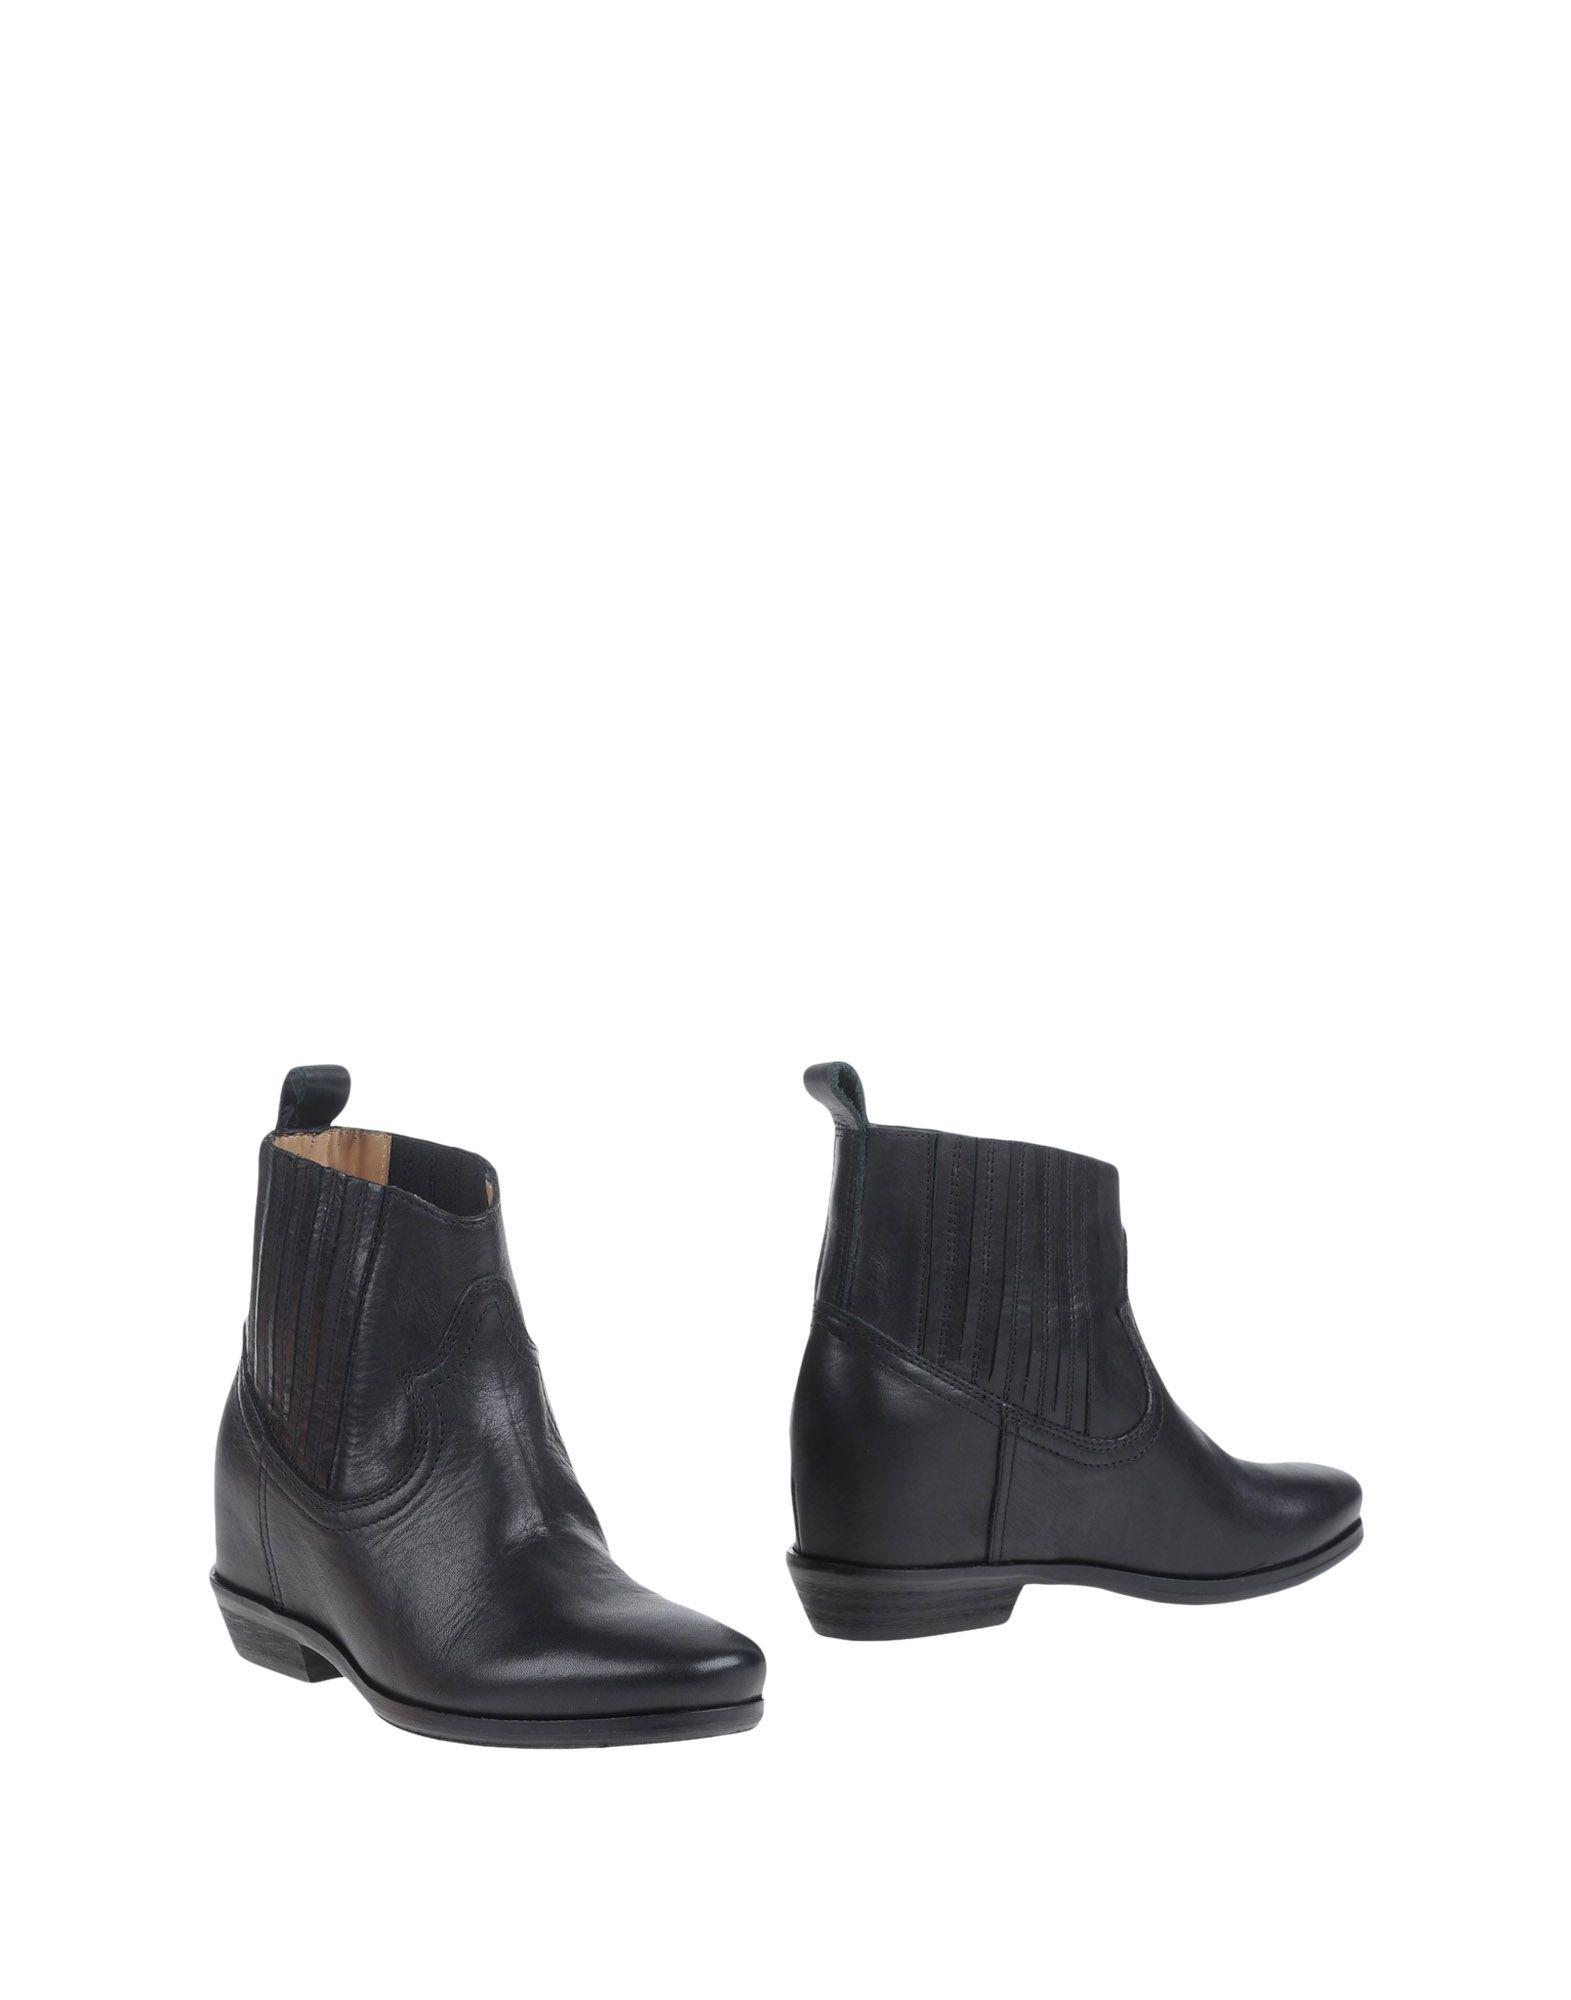 Stilvolle Chelsea billige Schuhe Liviana Conti Chelsea Stilvolle Boots Damen  11054904LQ b882ed